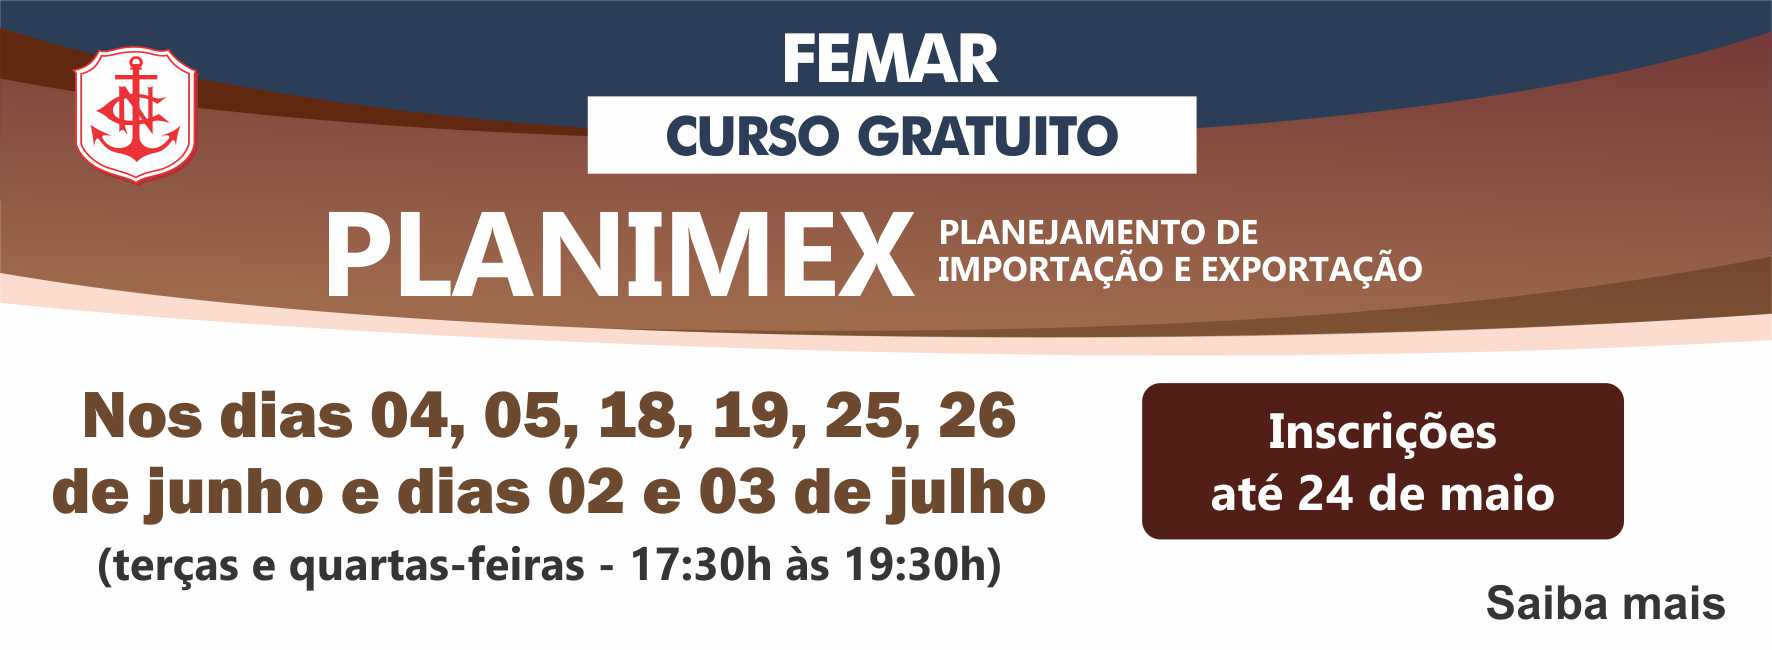 https://www.clubenaval.org.br/novo/planimex